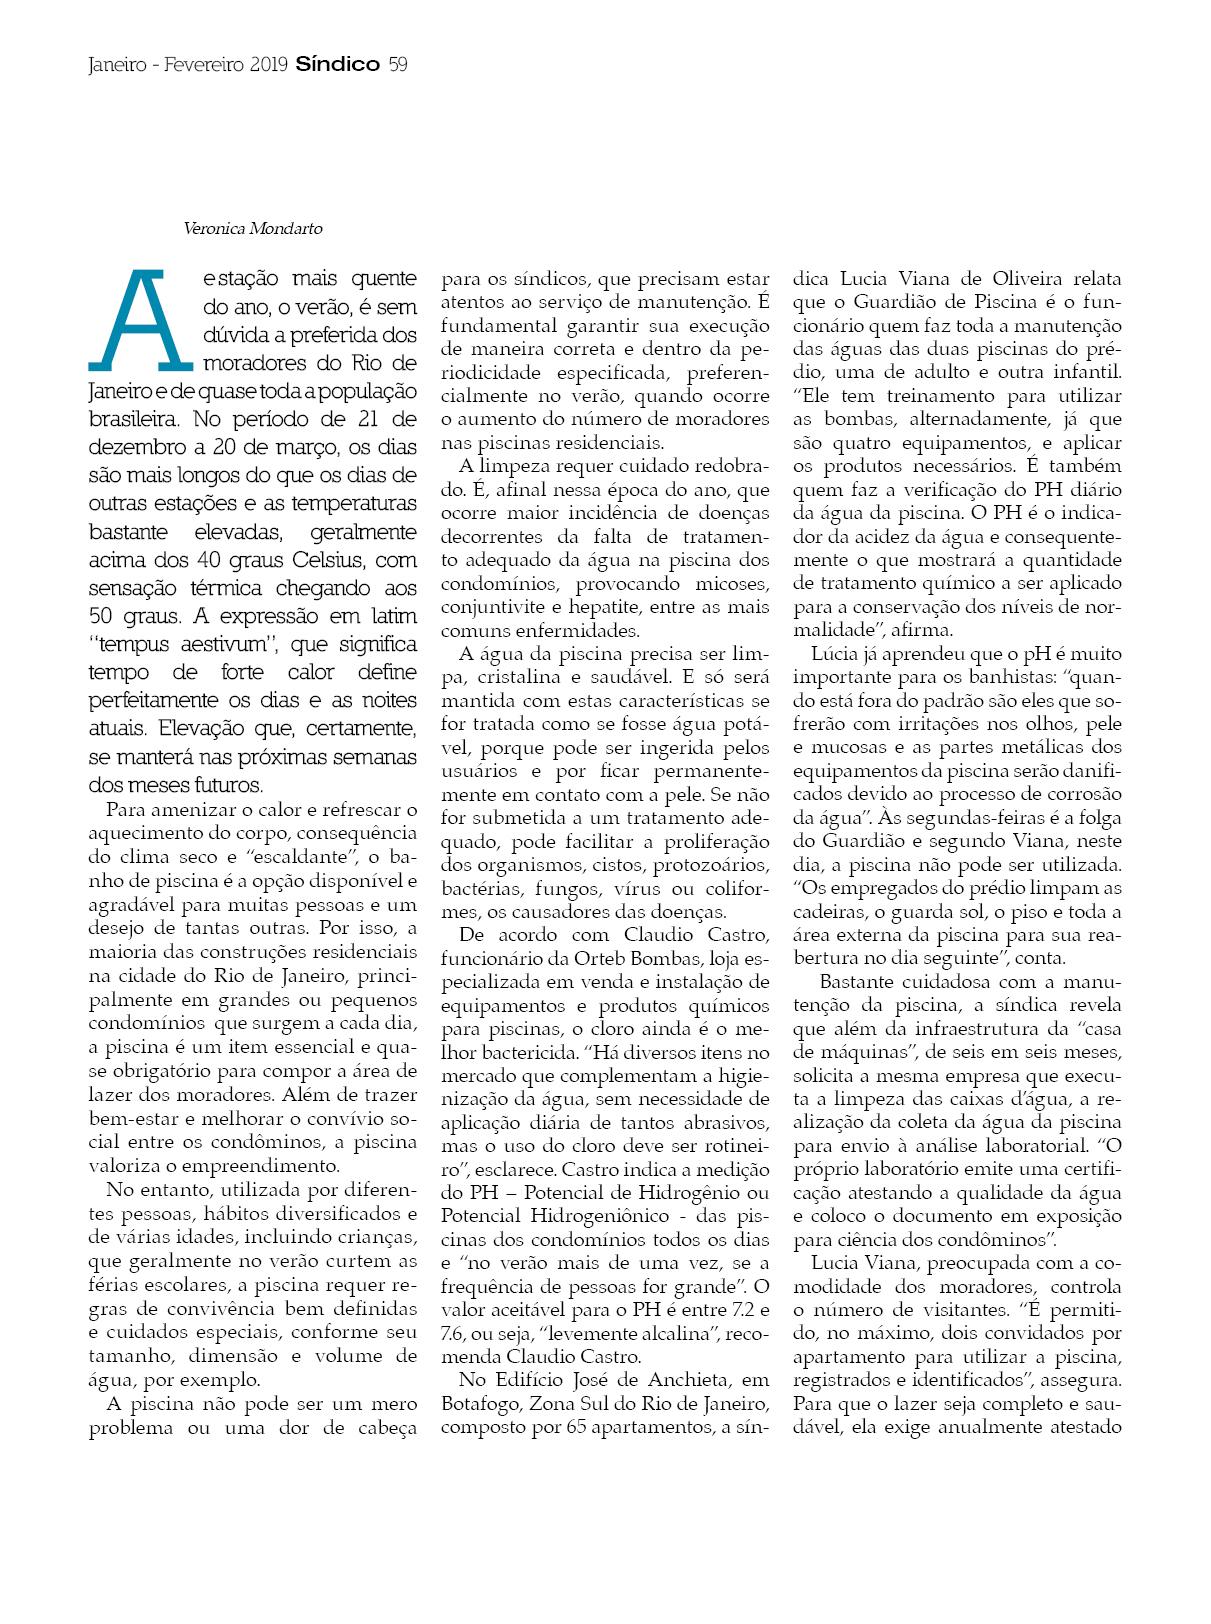 Revista Síndico_ed 242_57